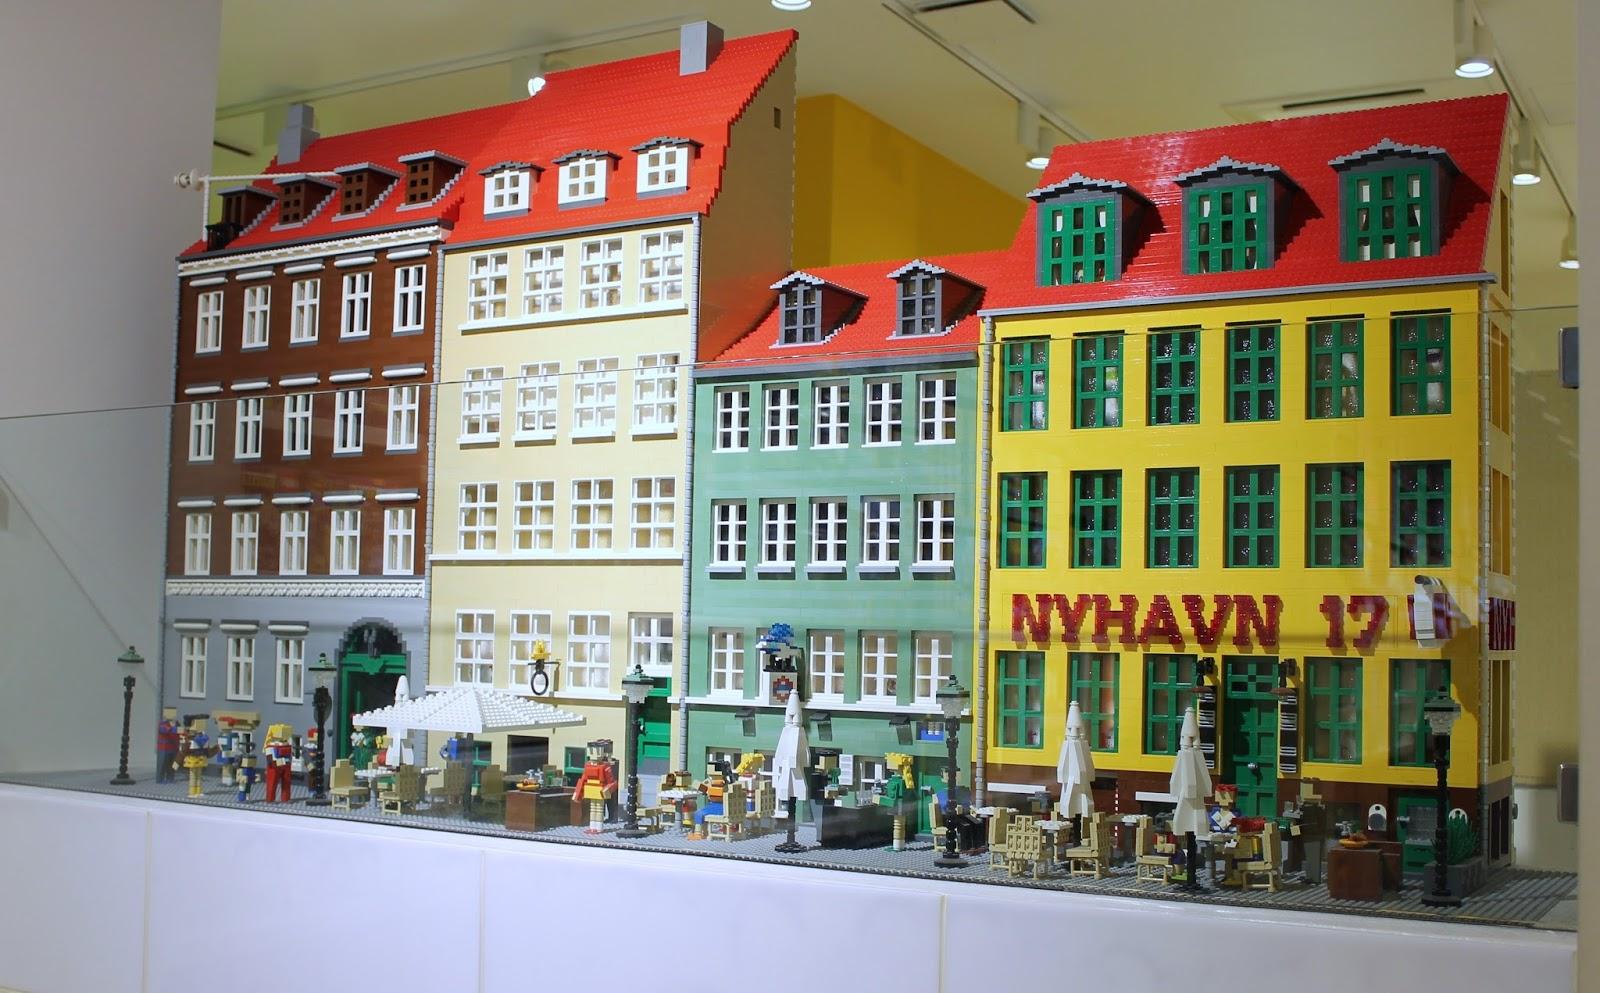 Lego Nyhavn - Copenhagen Travel Post